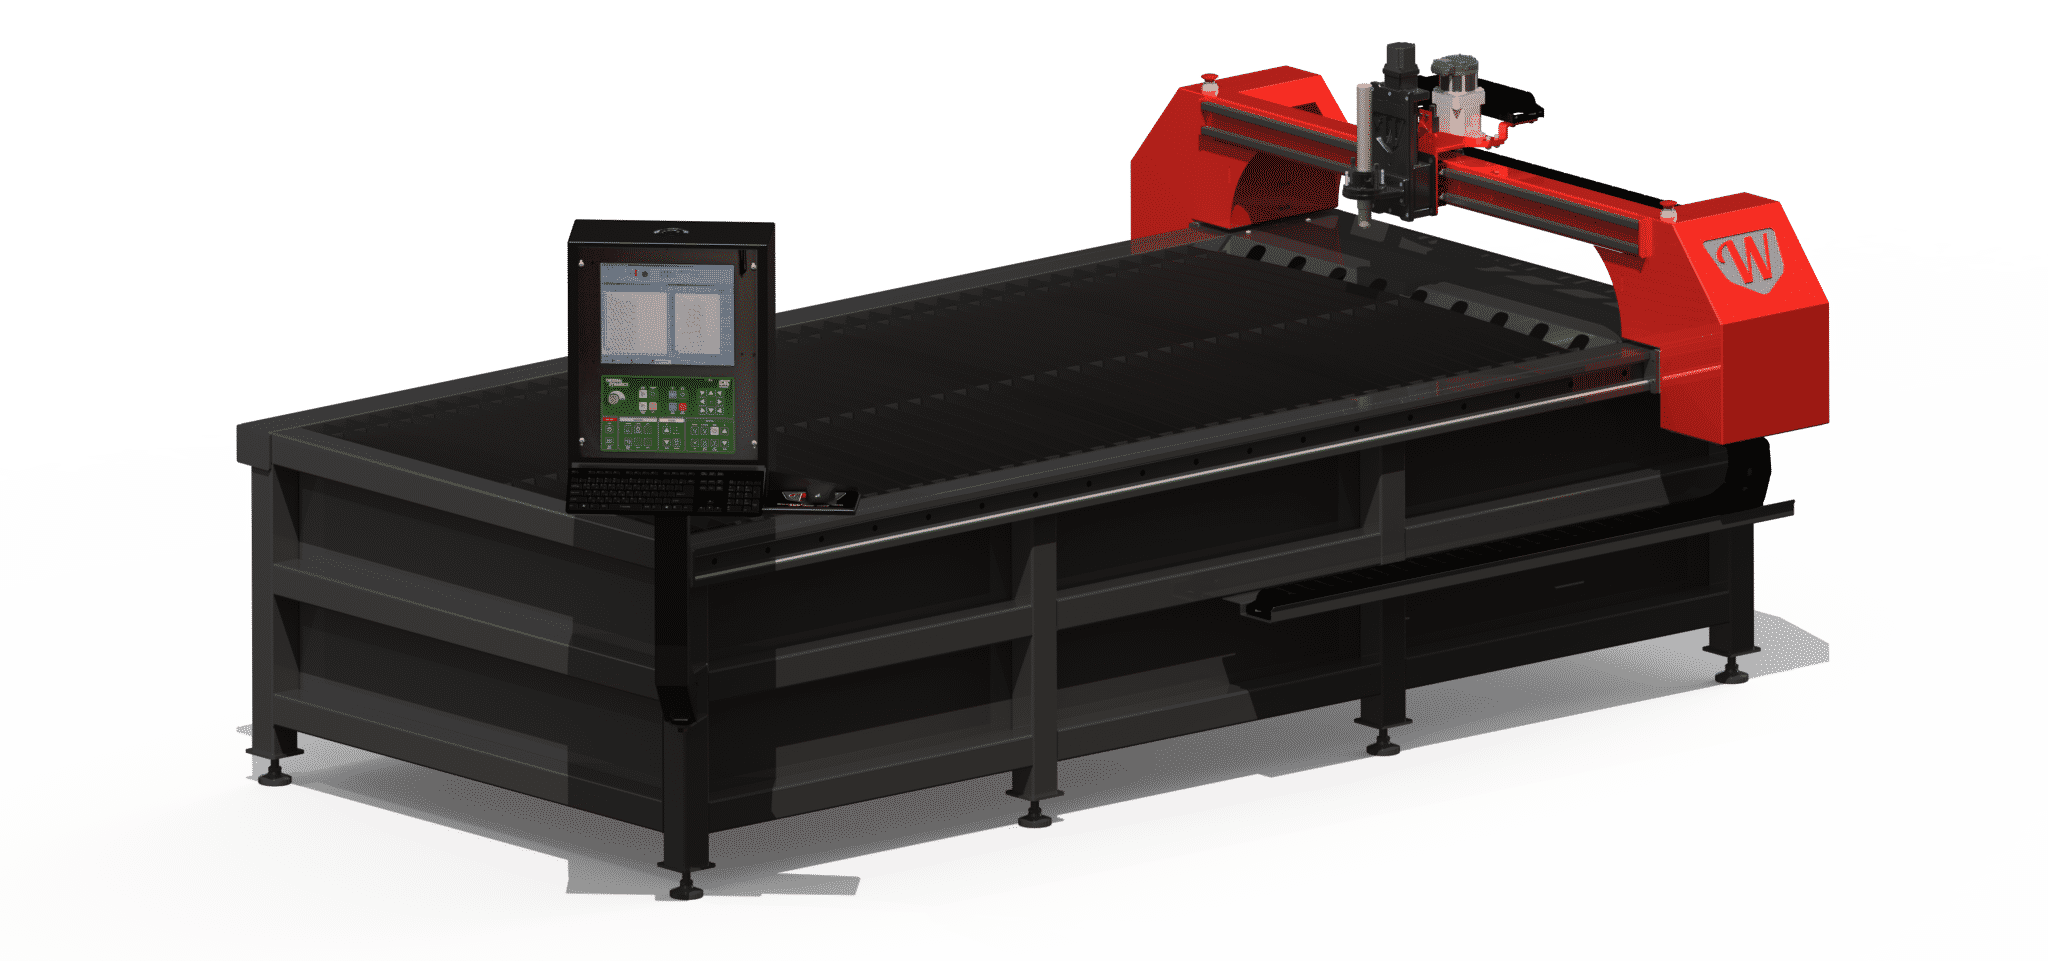 4X8 CNC Plasma Cutting Table by Westcott Plasma